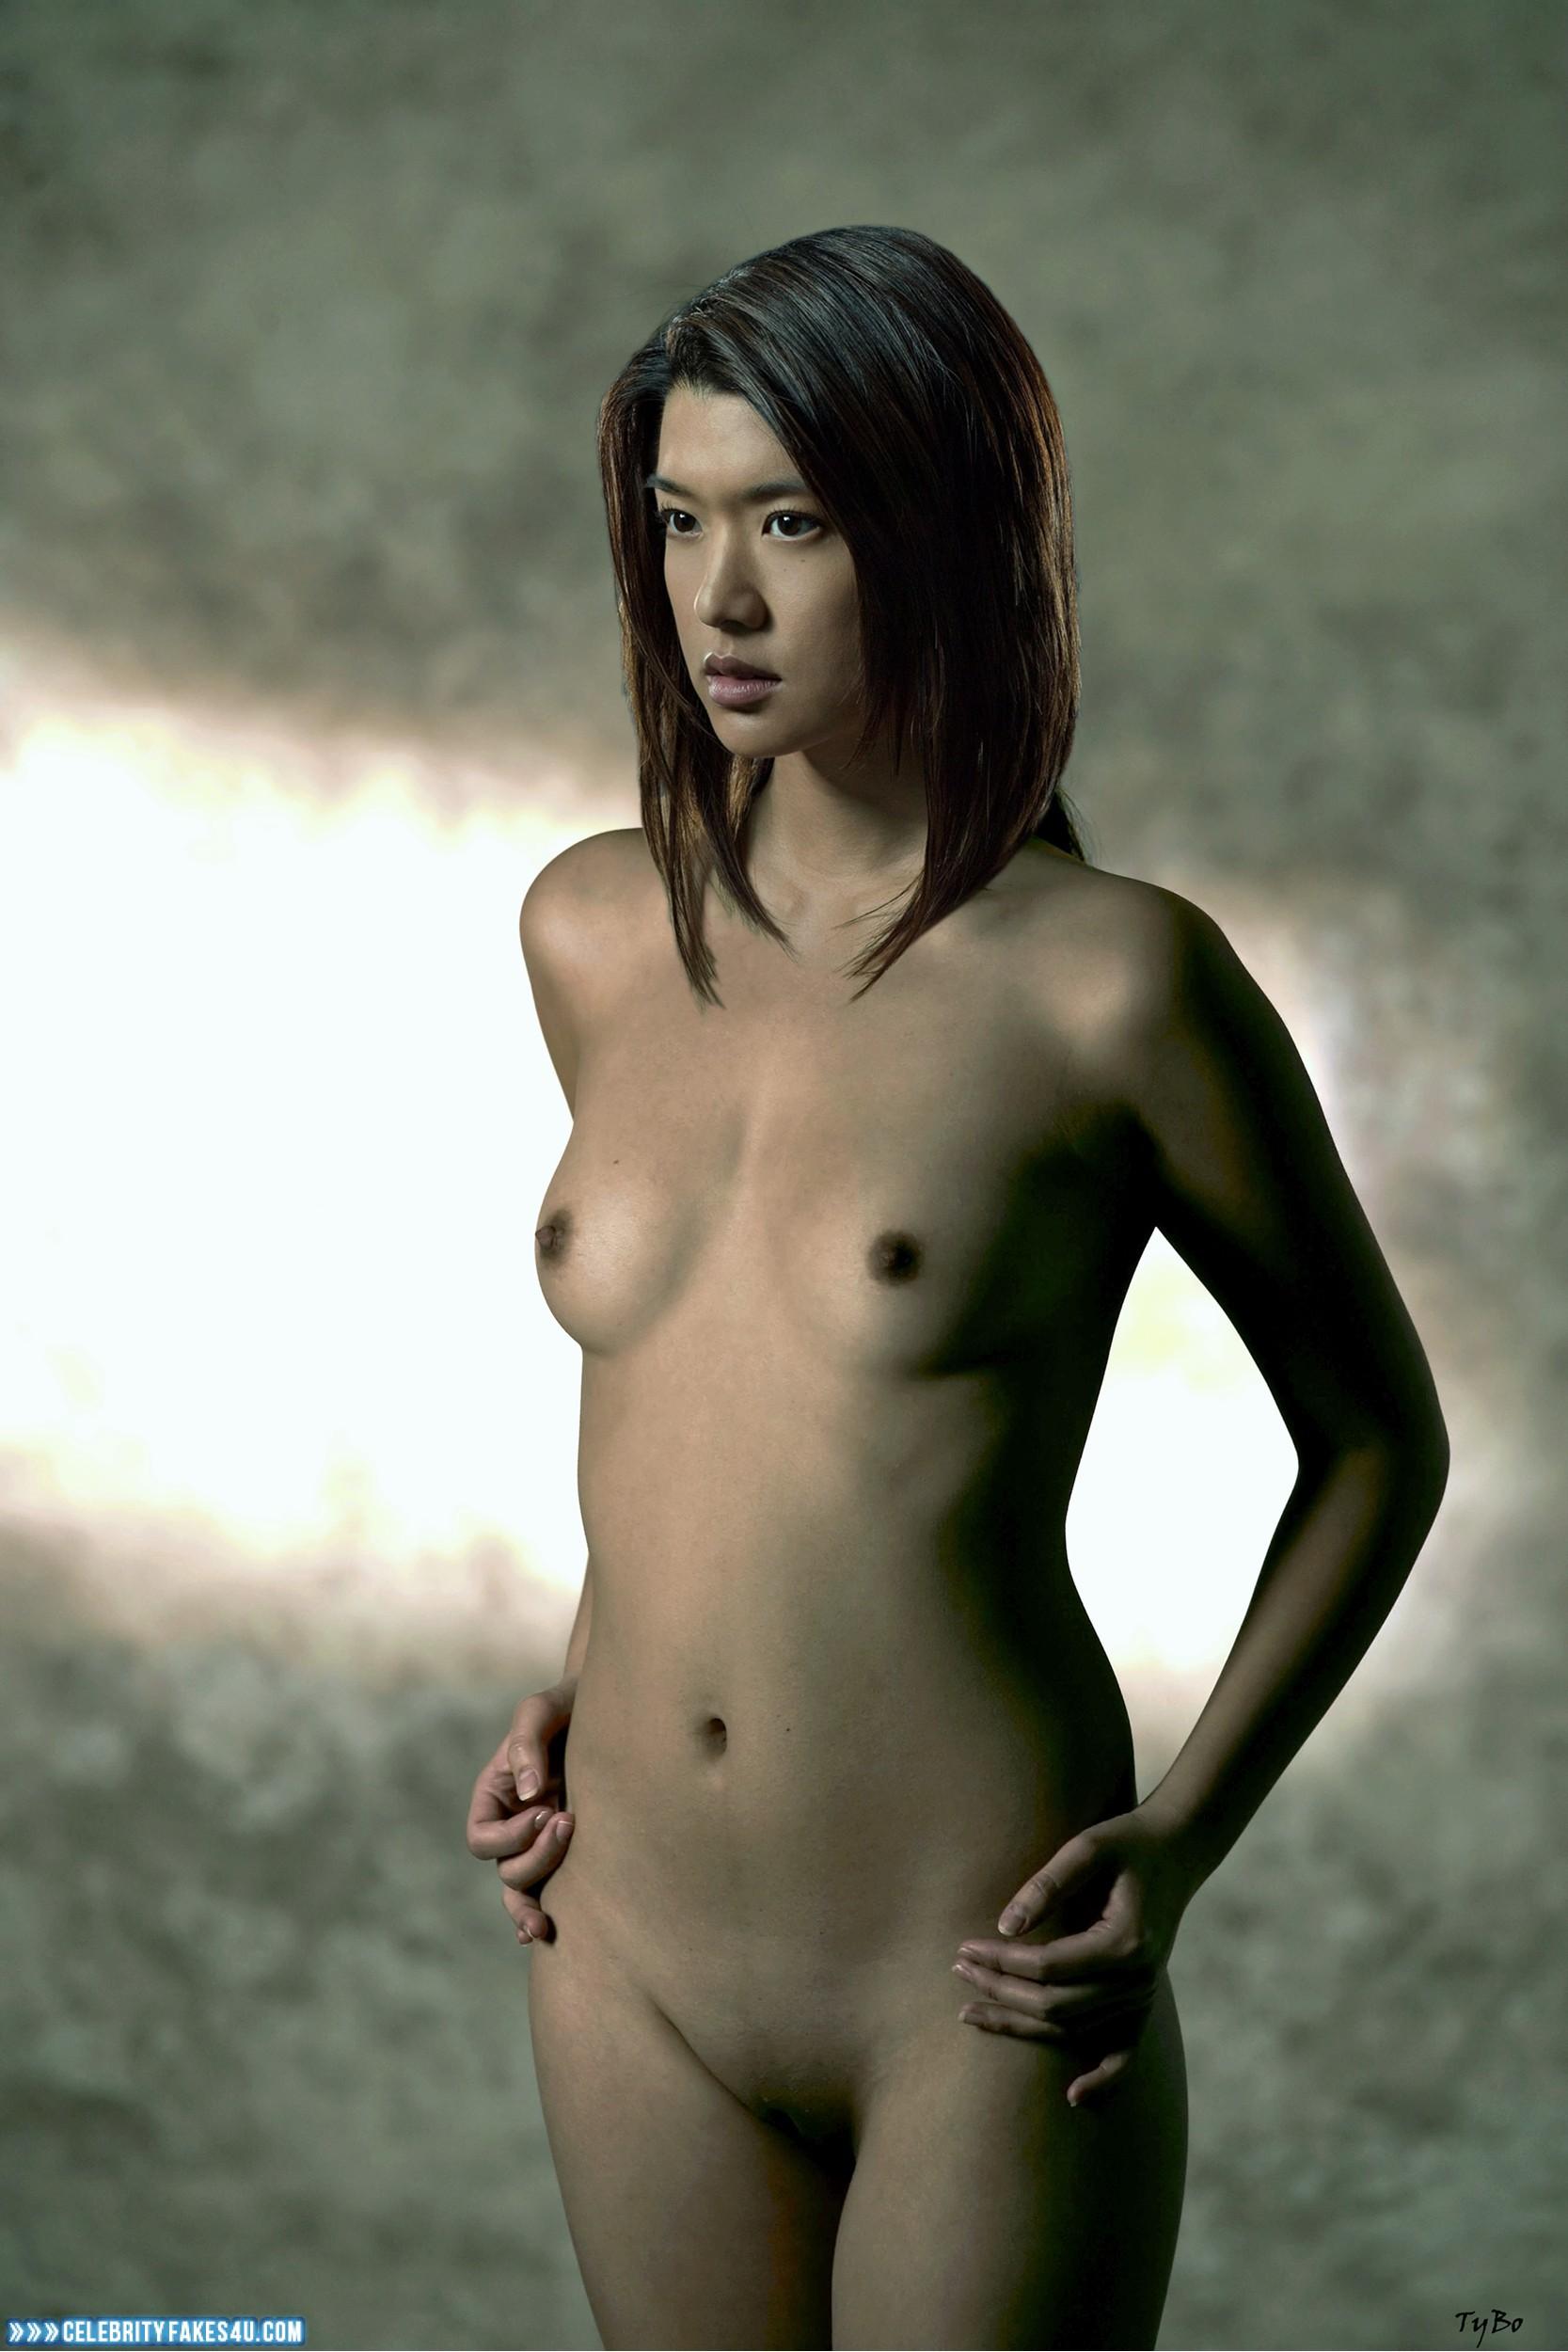 Grace Park Naked Body Small Boobs 001  Celebrityfakes4Ucom-7824